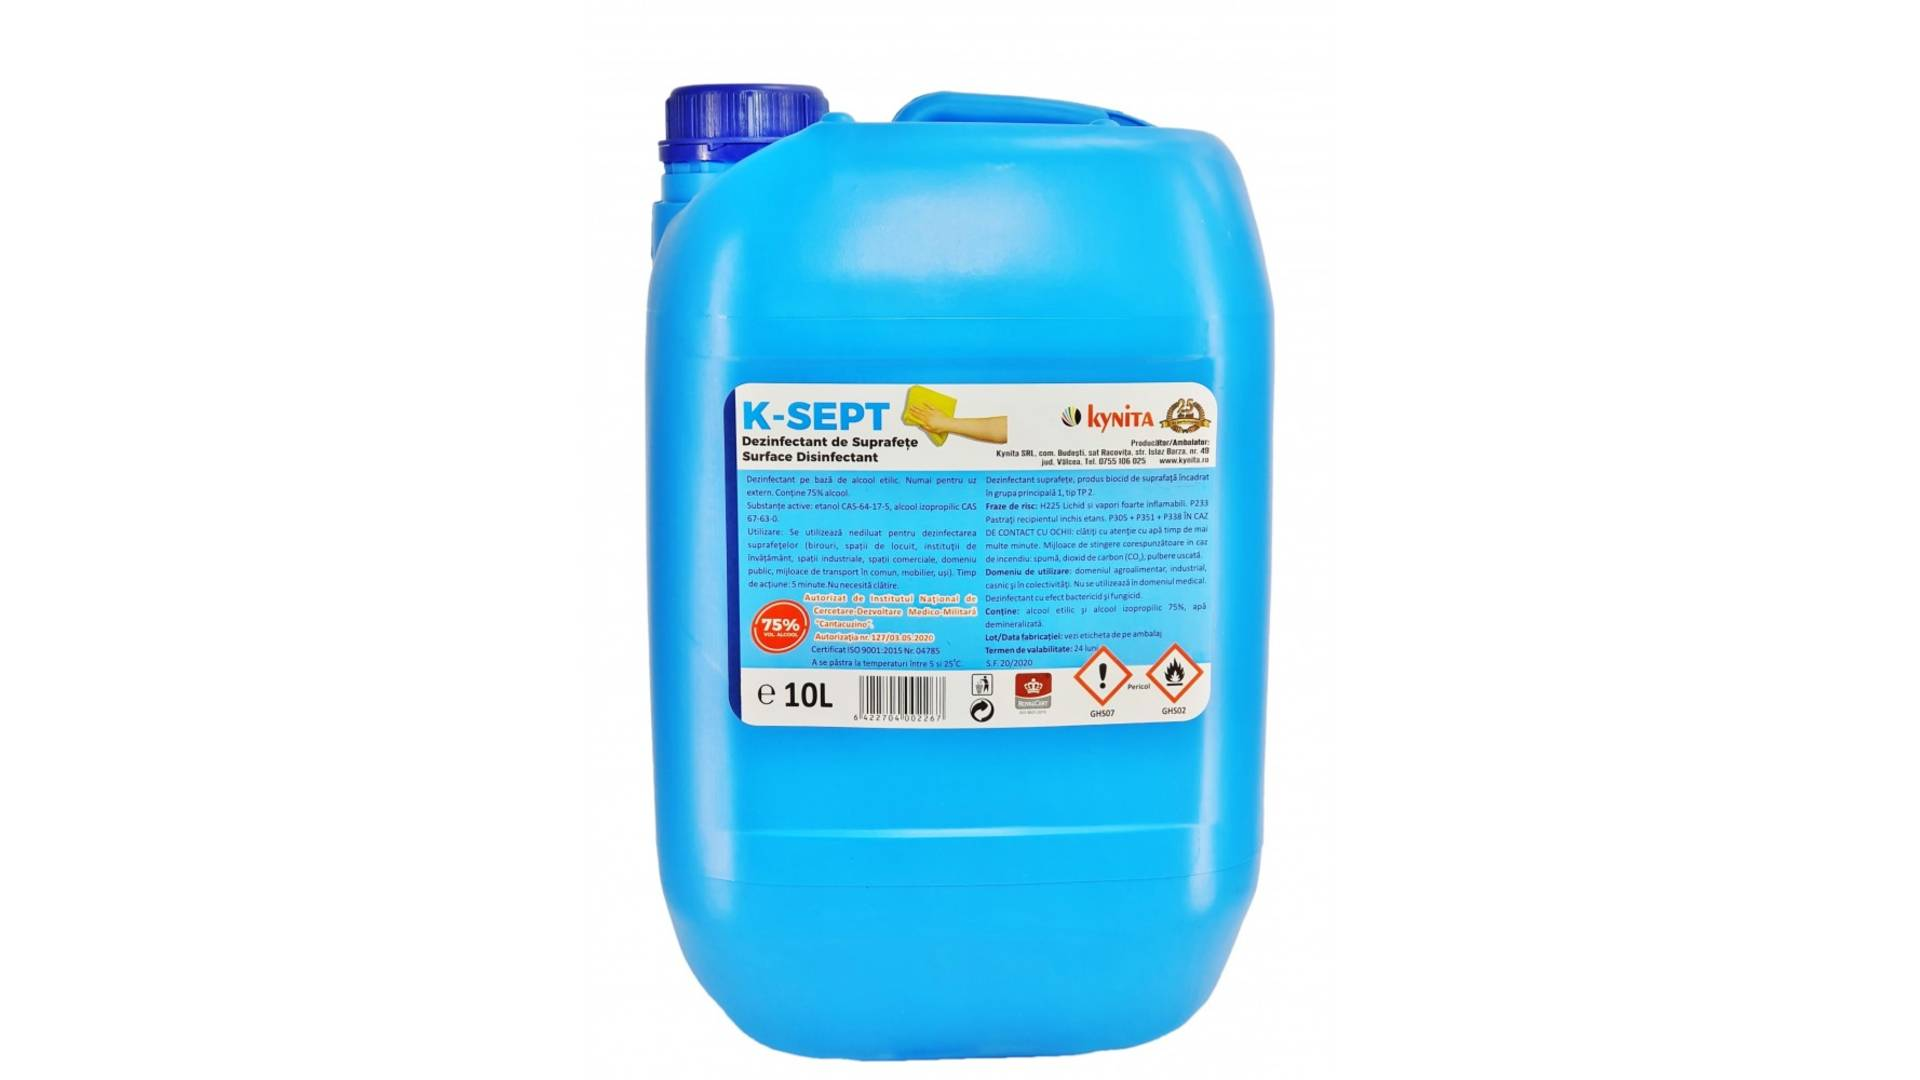 Dezinfectant de suprafete bidon 10 litri, alcool 75% imagine 2021 somnart.ro